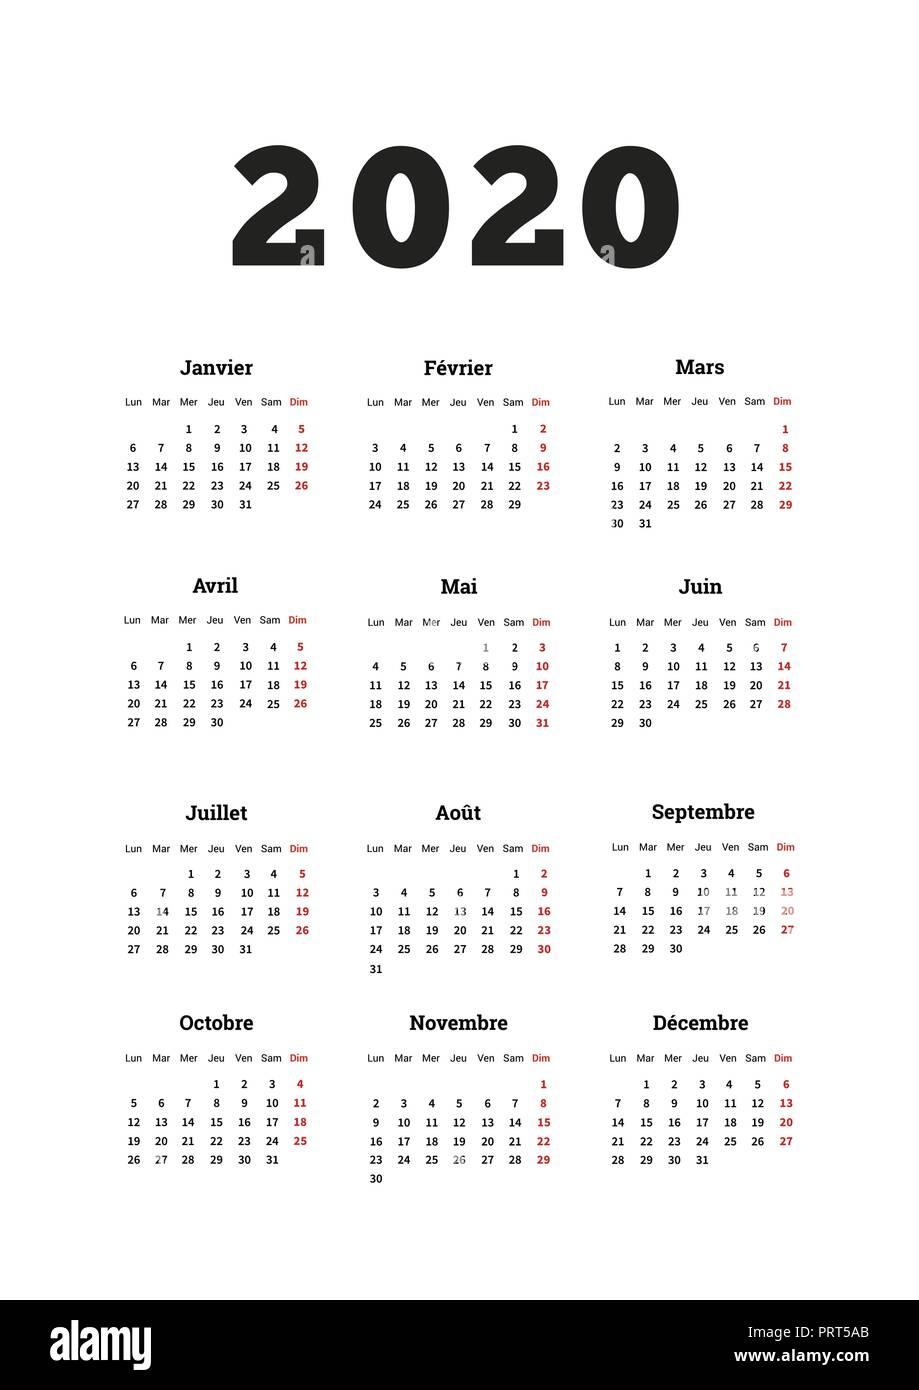 Calendario 2020 Orizzontale.French Calendar Week Immagini French Calendar Week Fotos